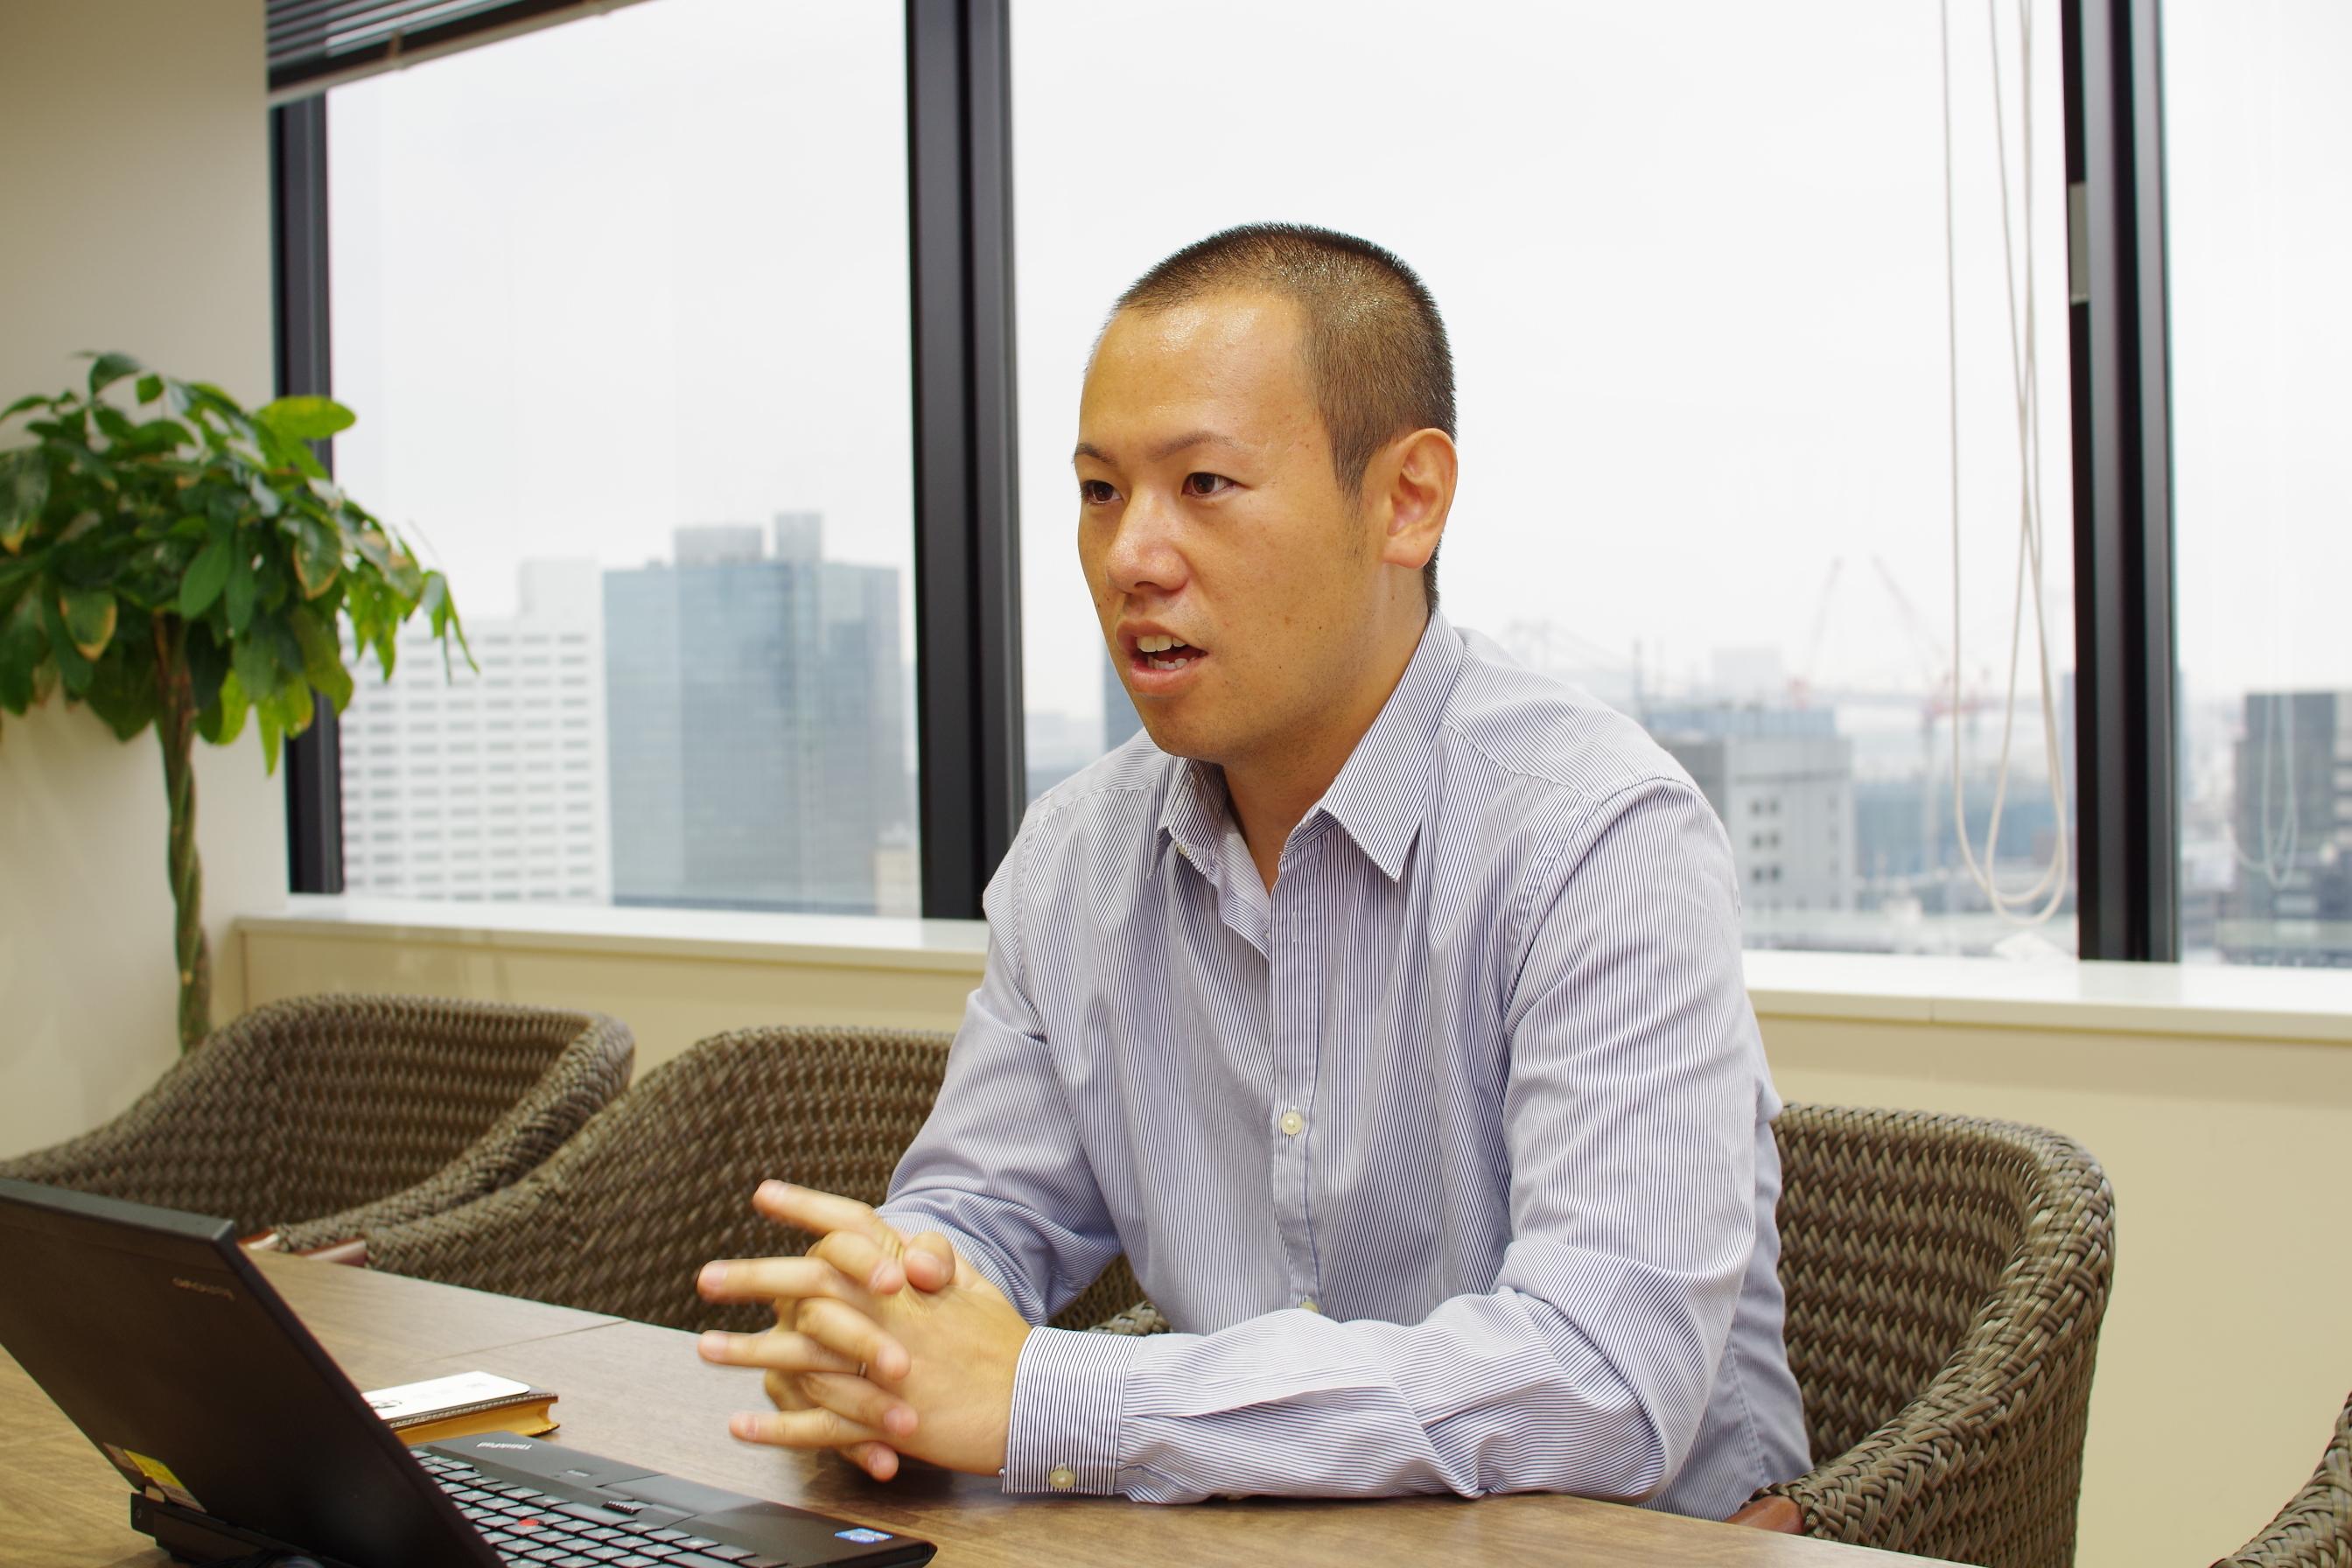 SMS介護経営支援事業部 経営支援グループ カスタマーサービスチーム チーム長の本田克徳さん